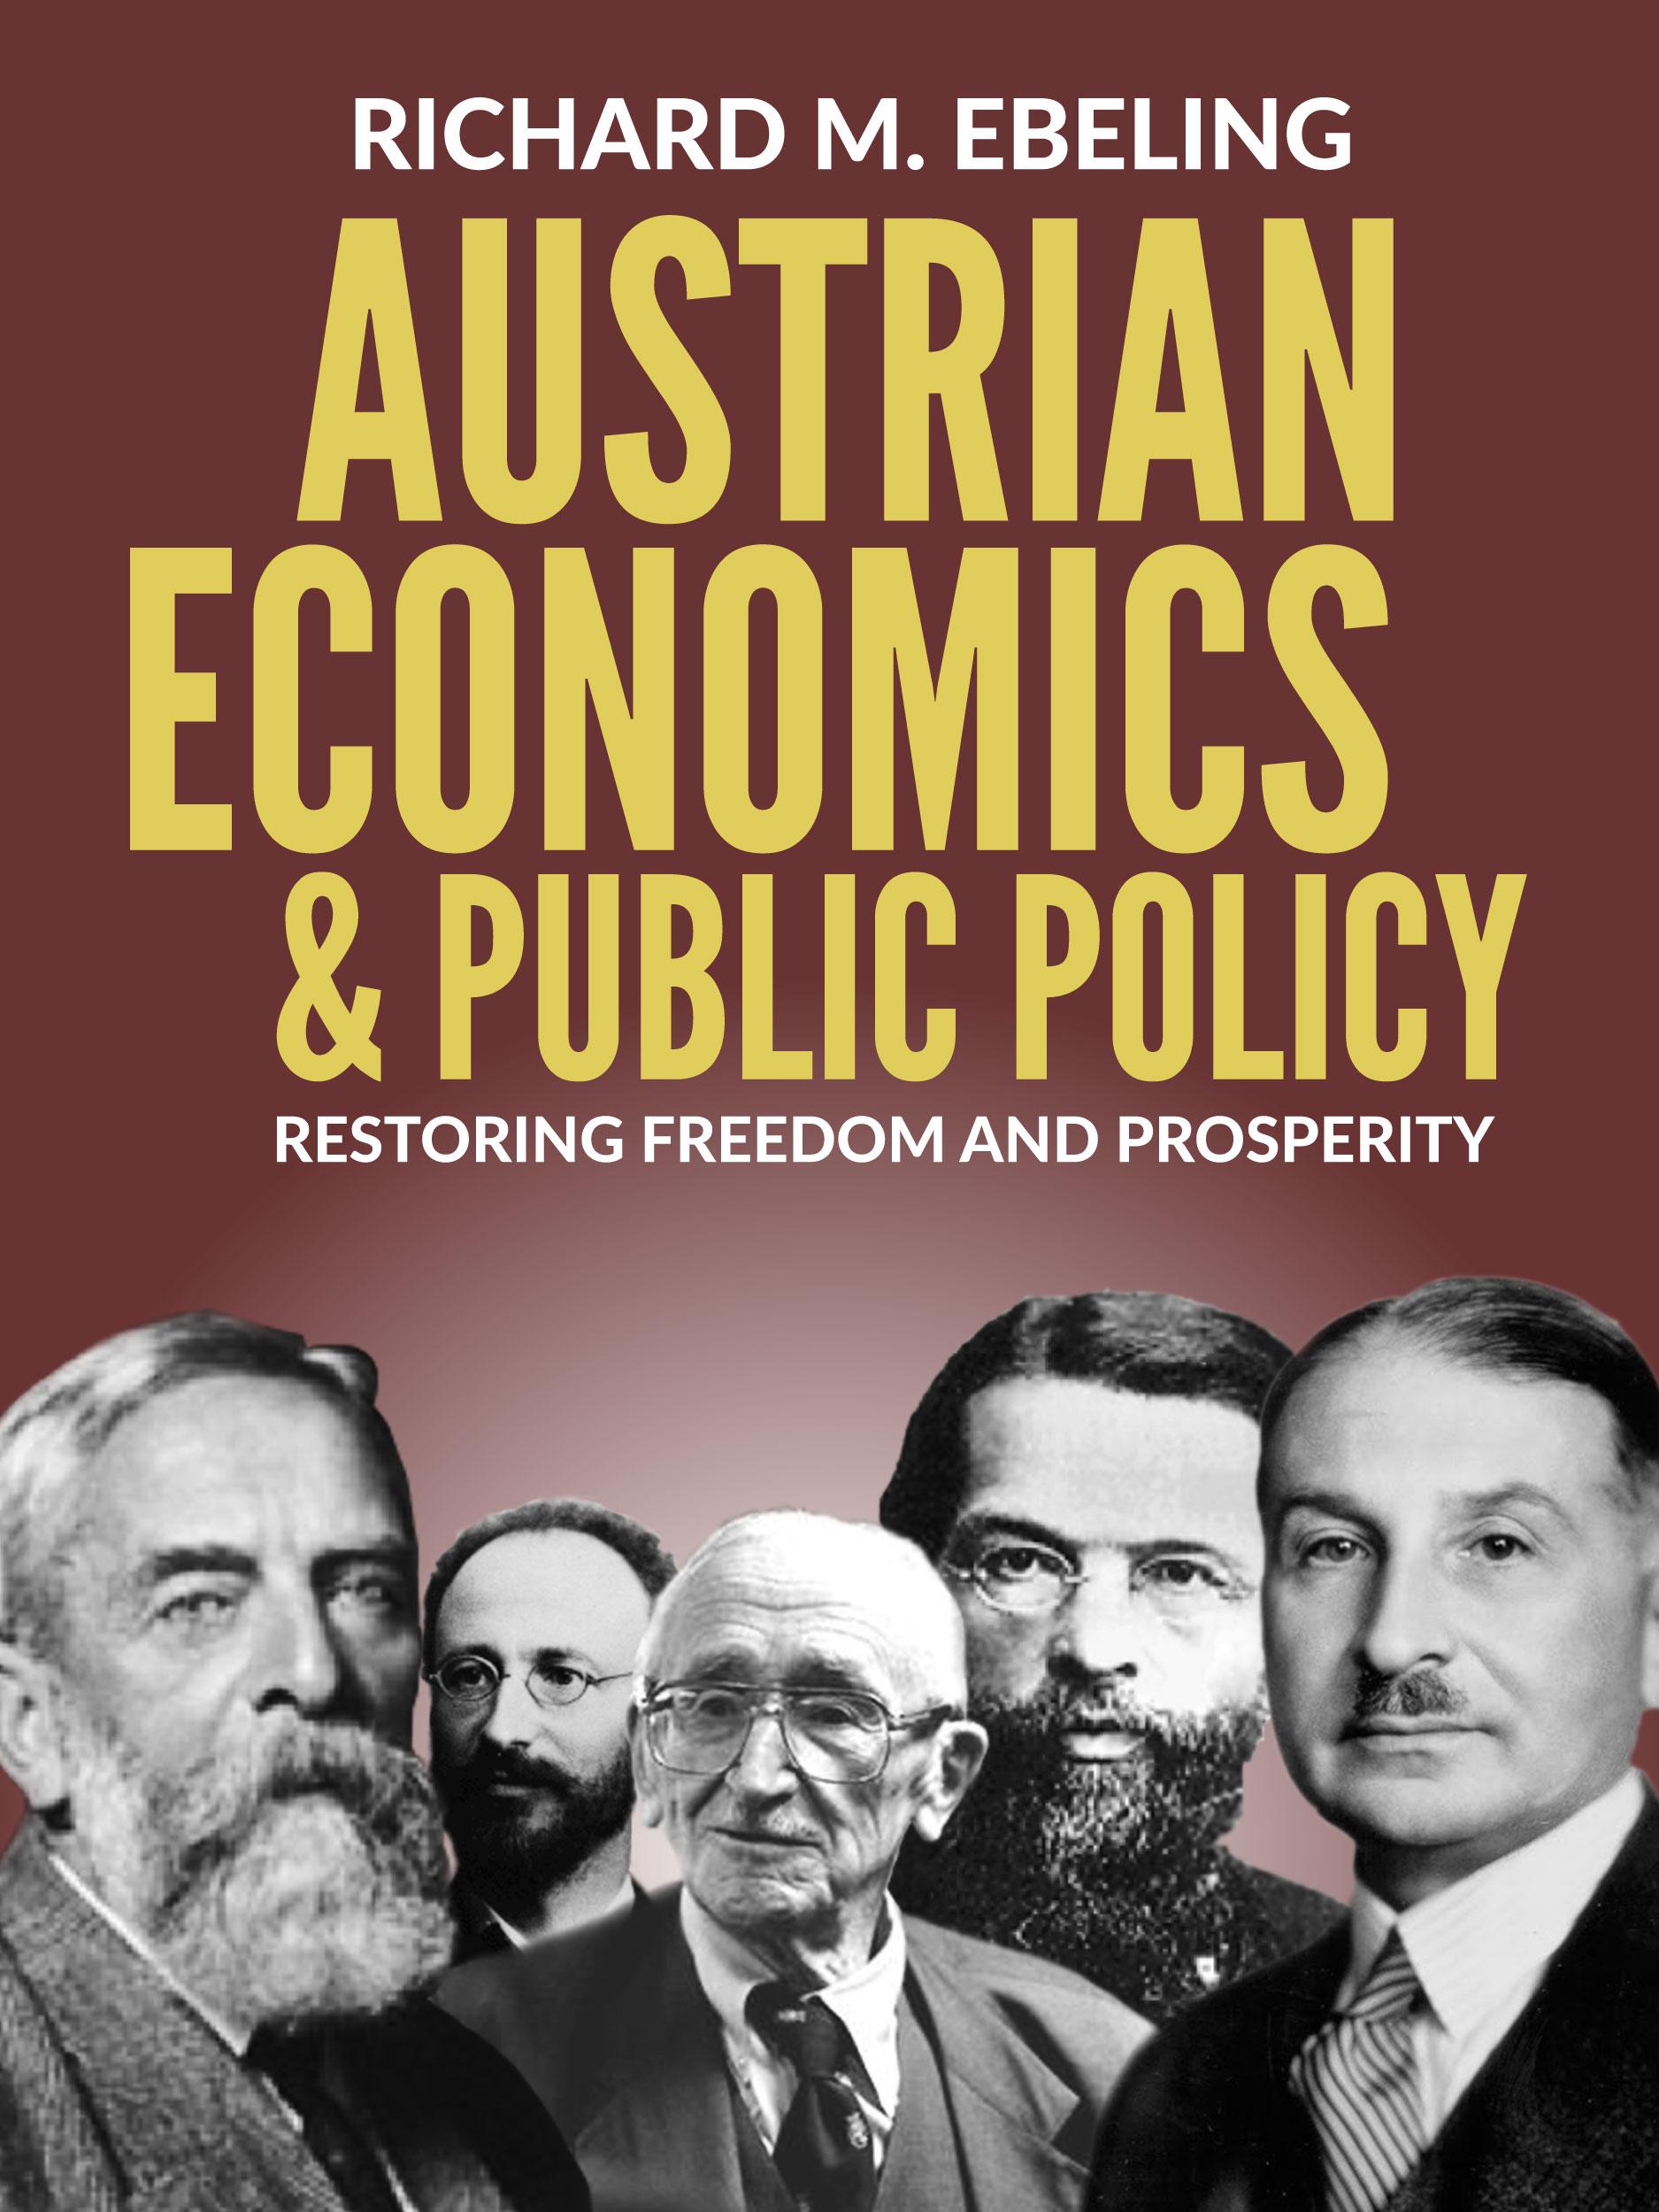 Austrian Economics & Public Policy